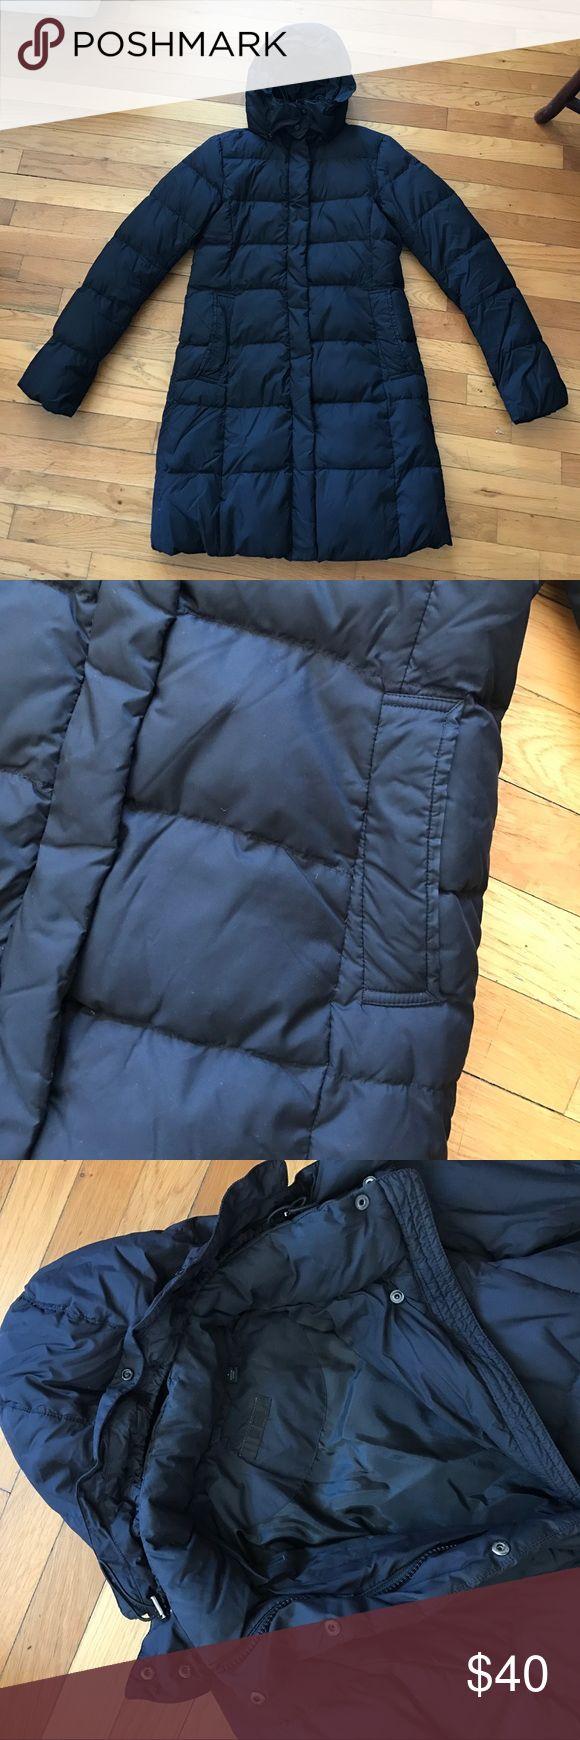 Uniqlo Light Down Jacket Black, light down Jacket. Uniqlo Jackets & Coats Puffers